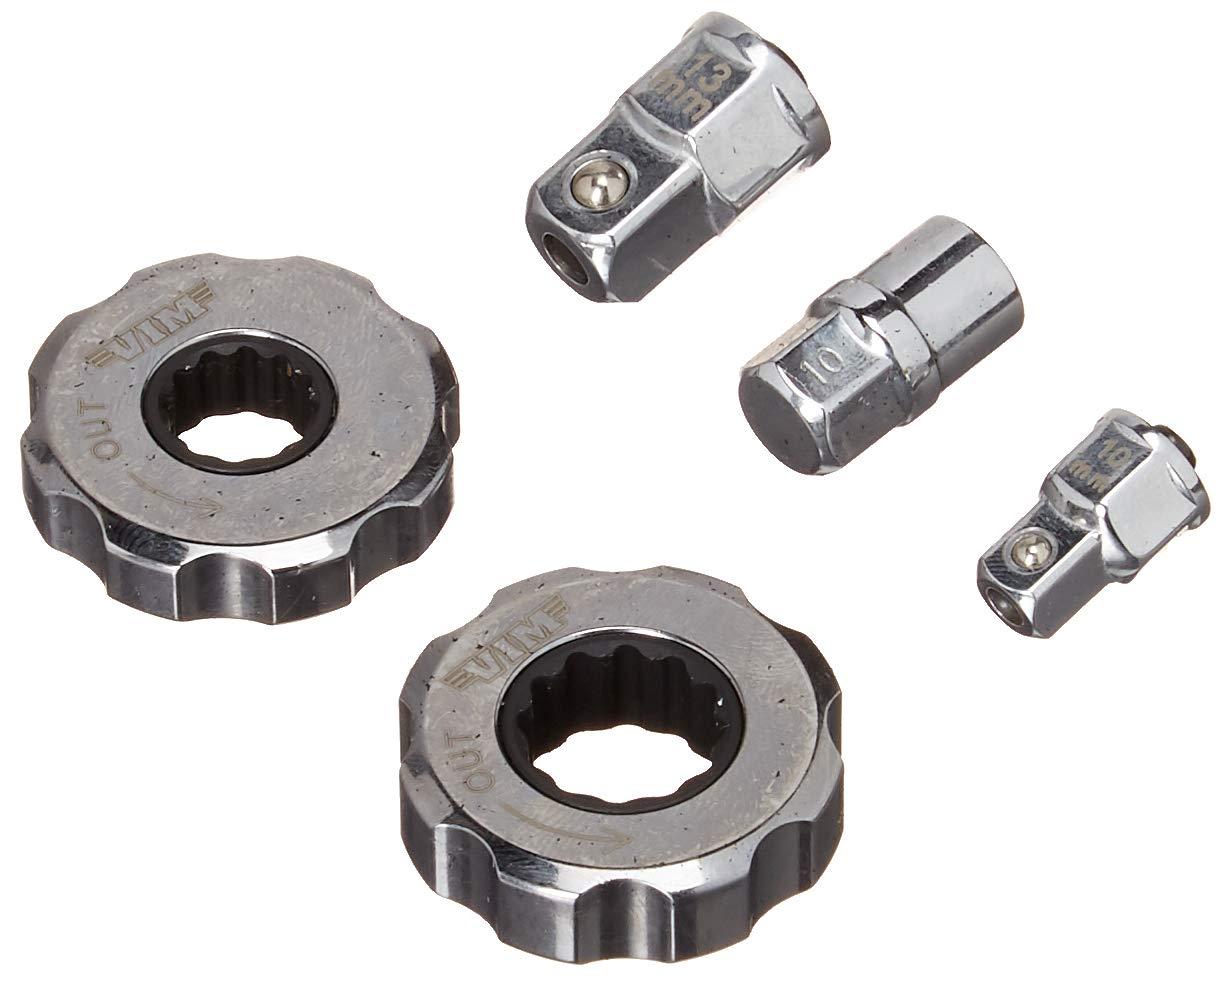 Vim Tools VIMFR100 Finger RATCHET Set Vim Products 39692